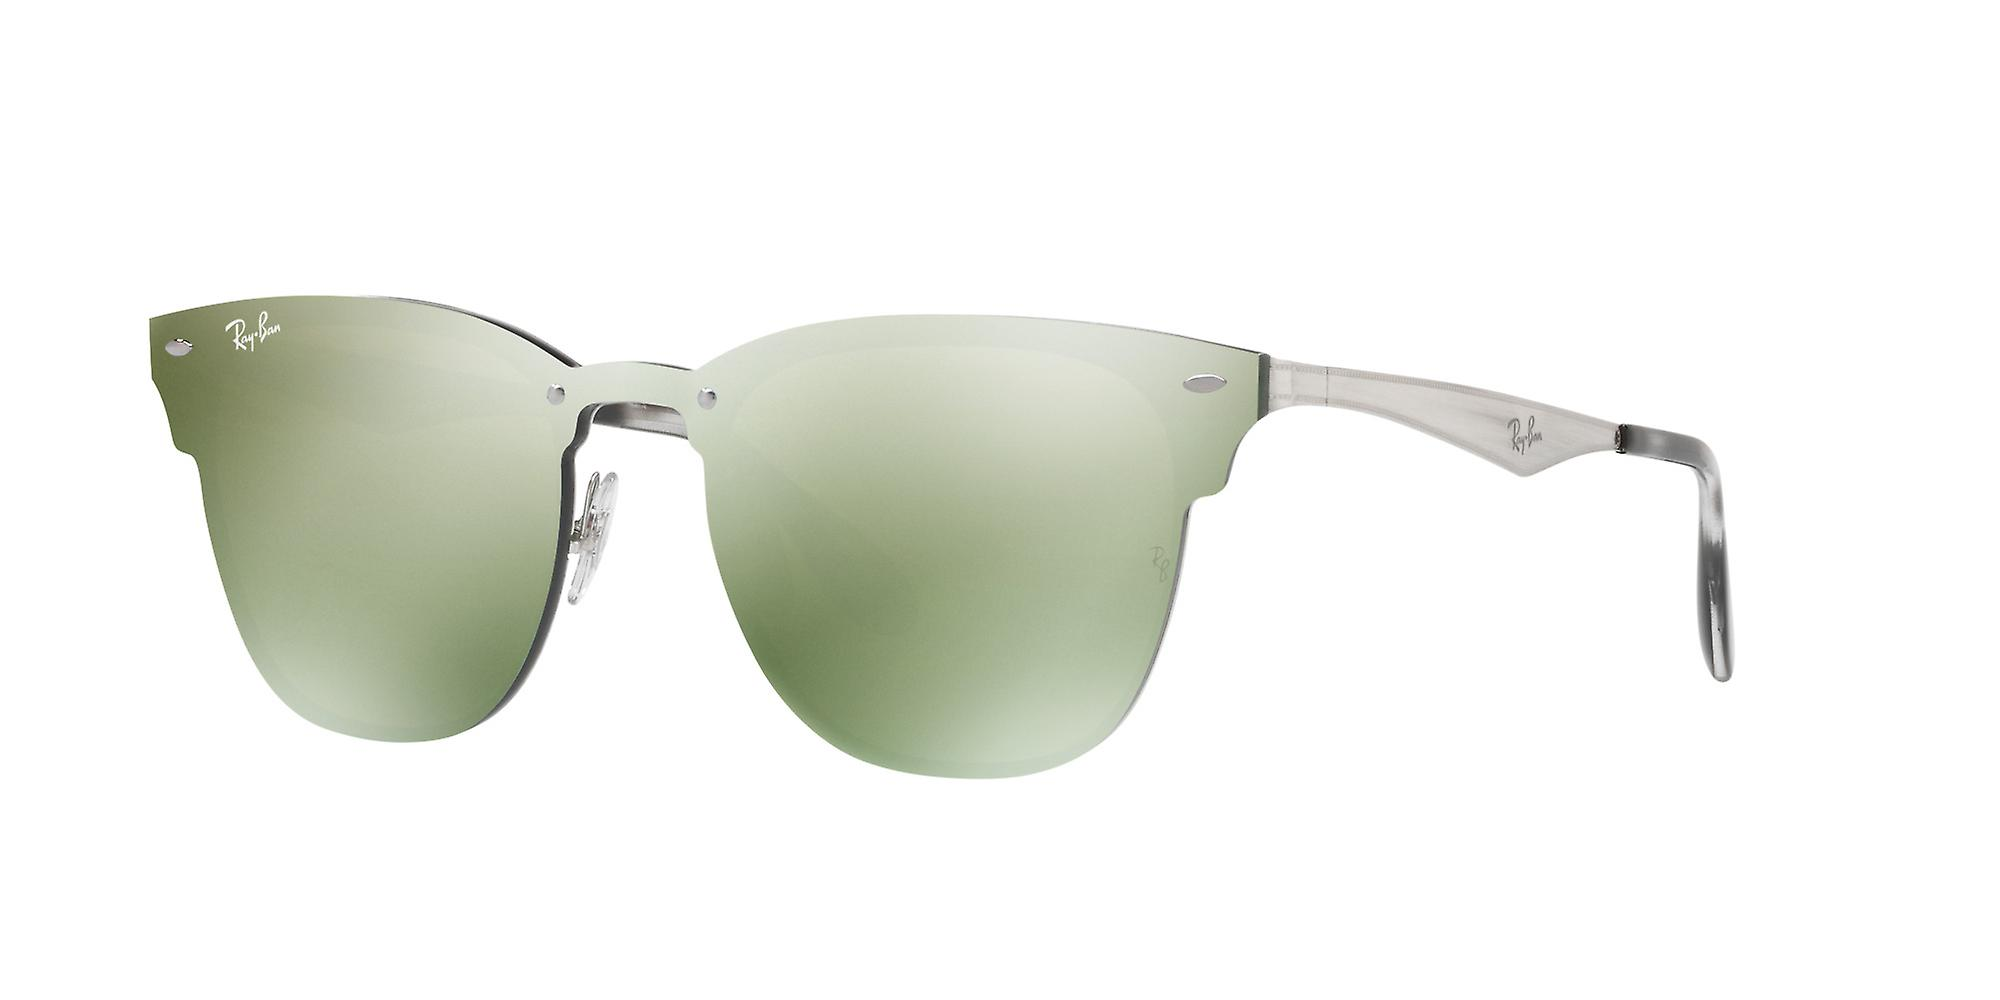 Ray-Ban Blaze Clubmaster RB3576N 042/30 Silver/Green-Silver Mirror Sunglasses